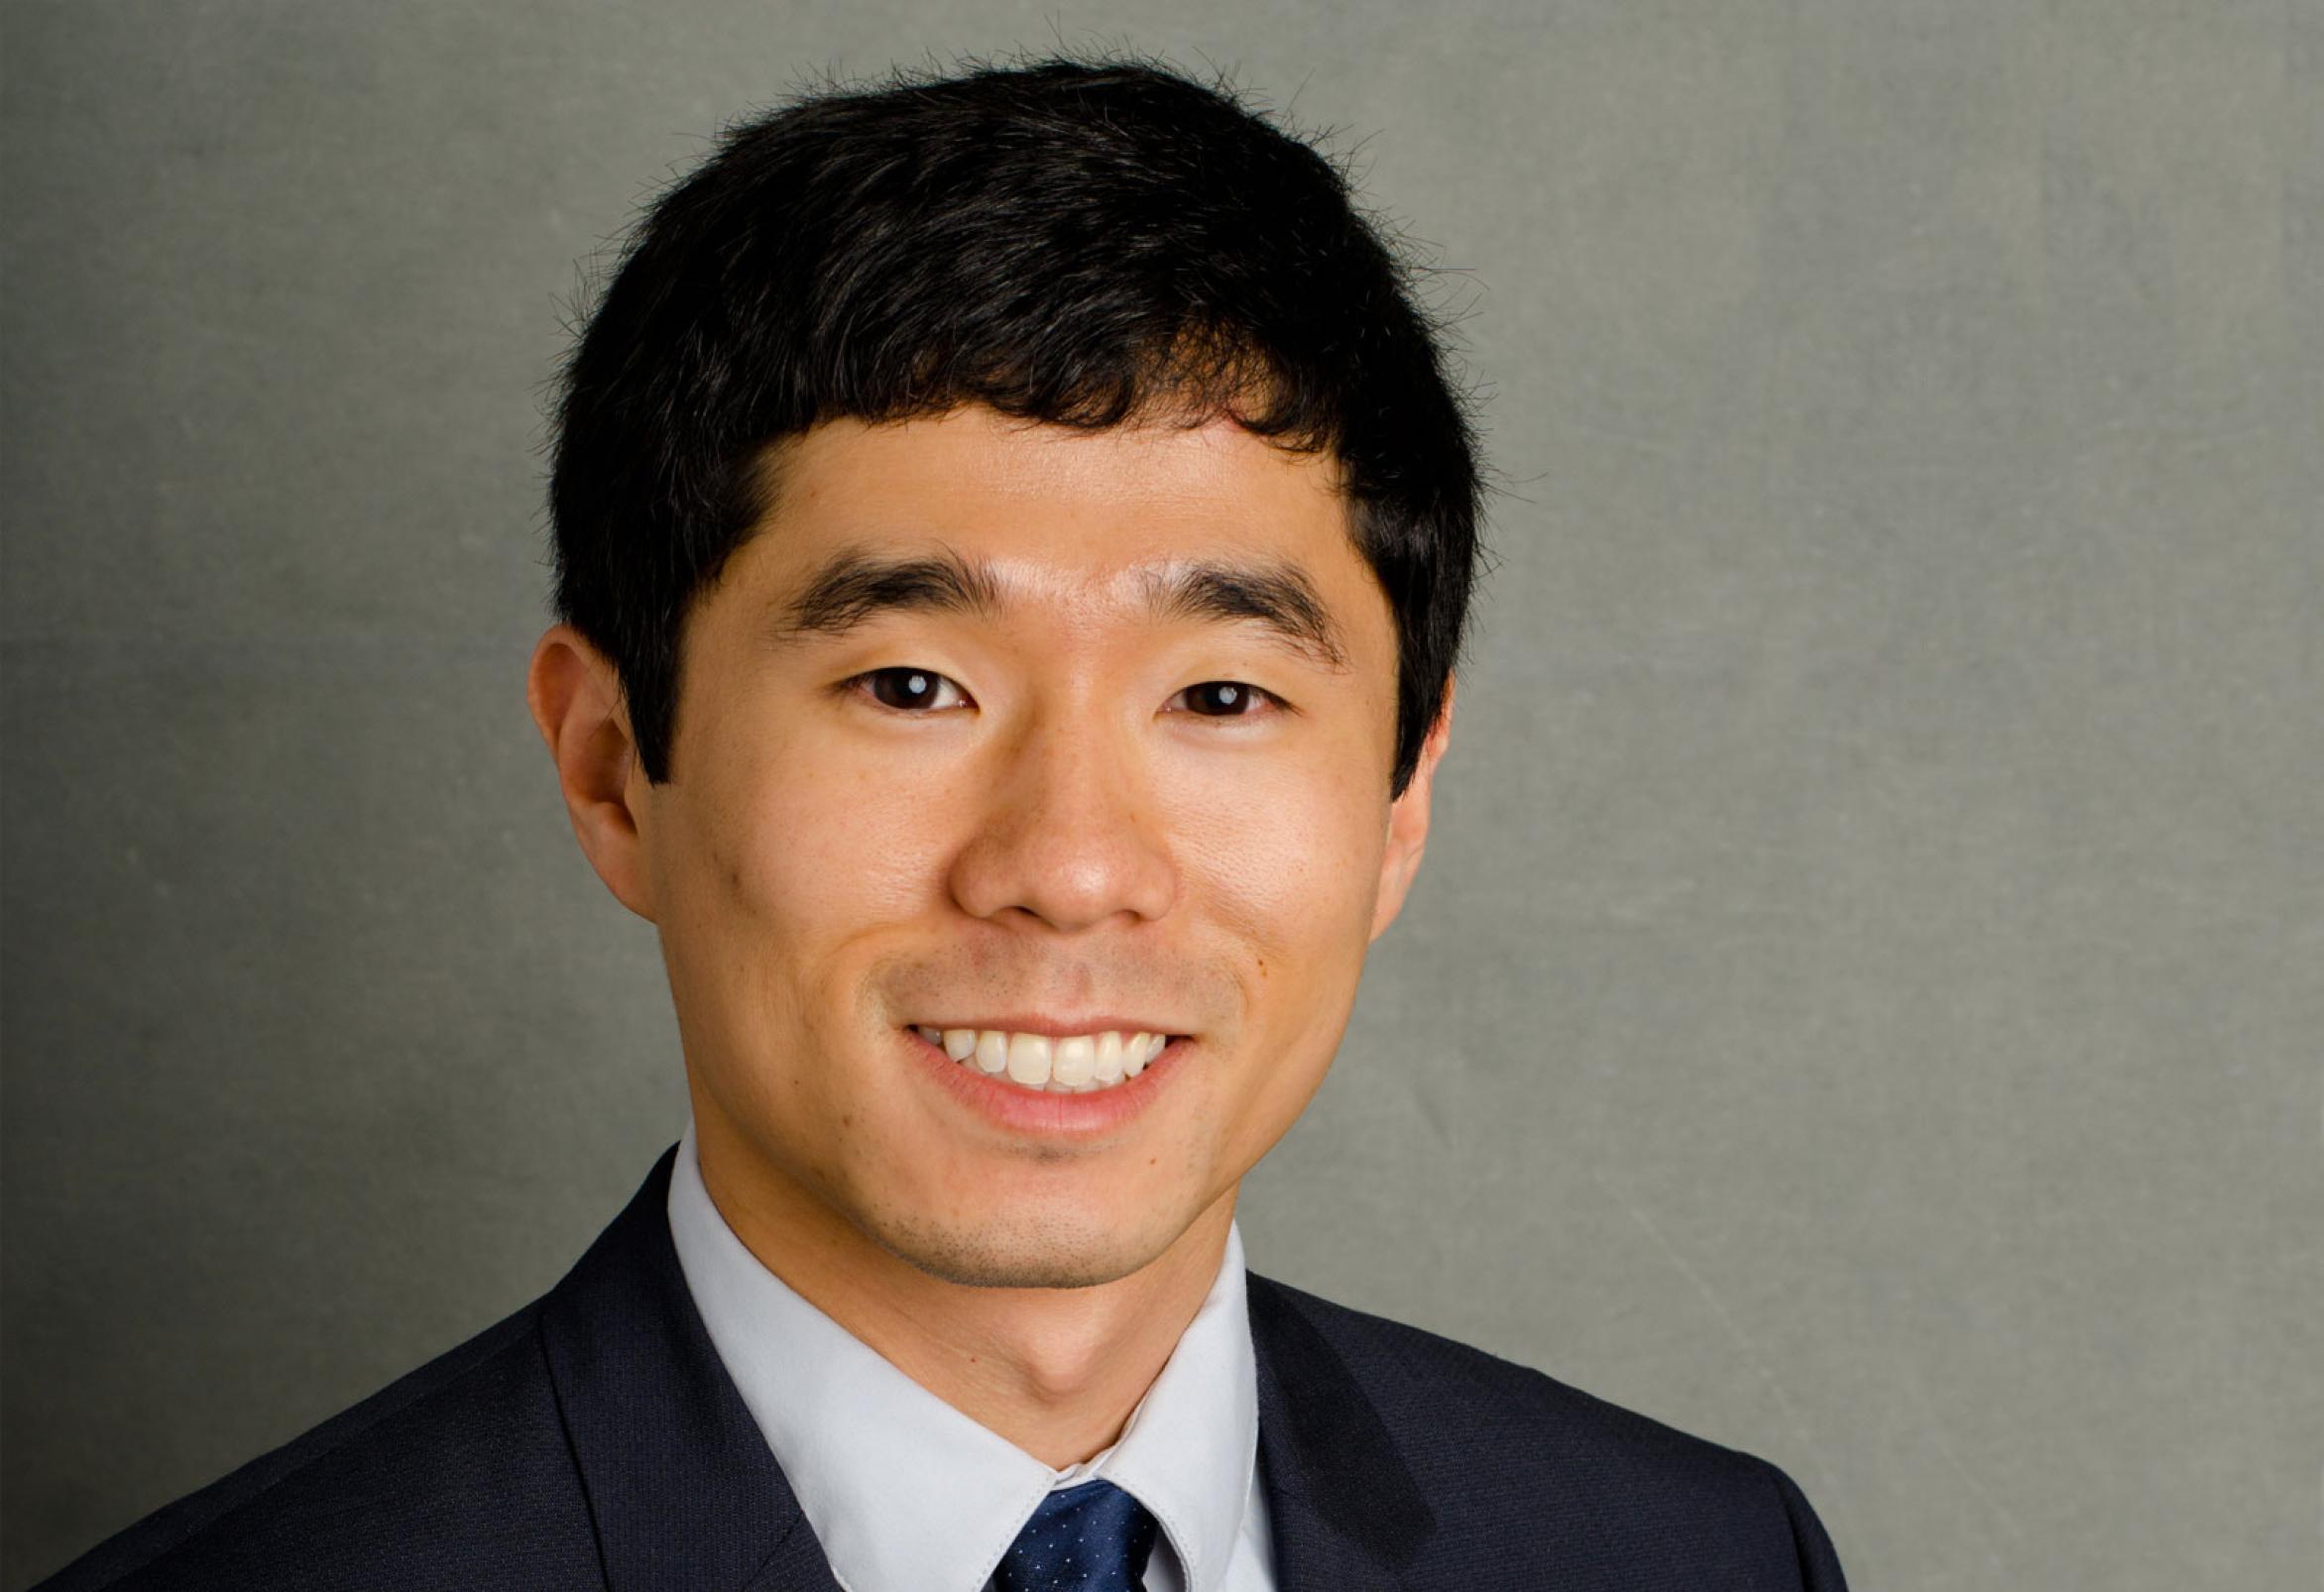 Brian Lucas, assistant professor of organizational behavior at the ILR School